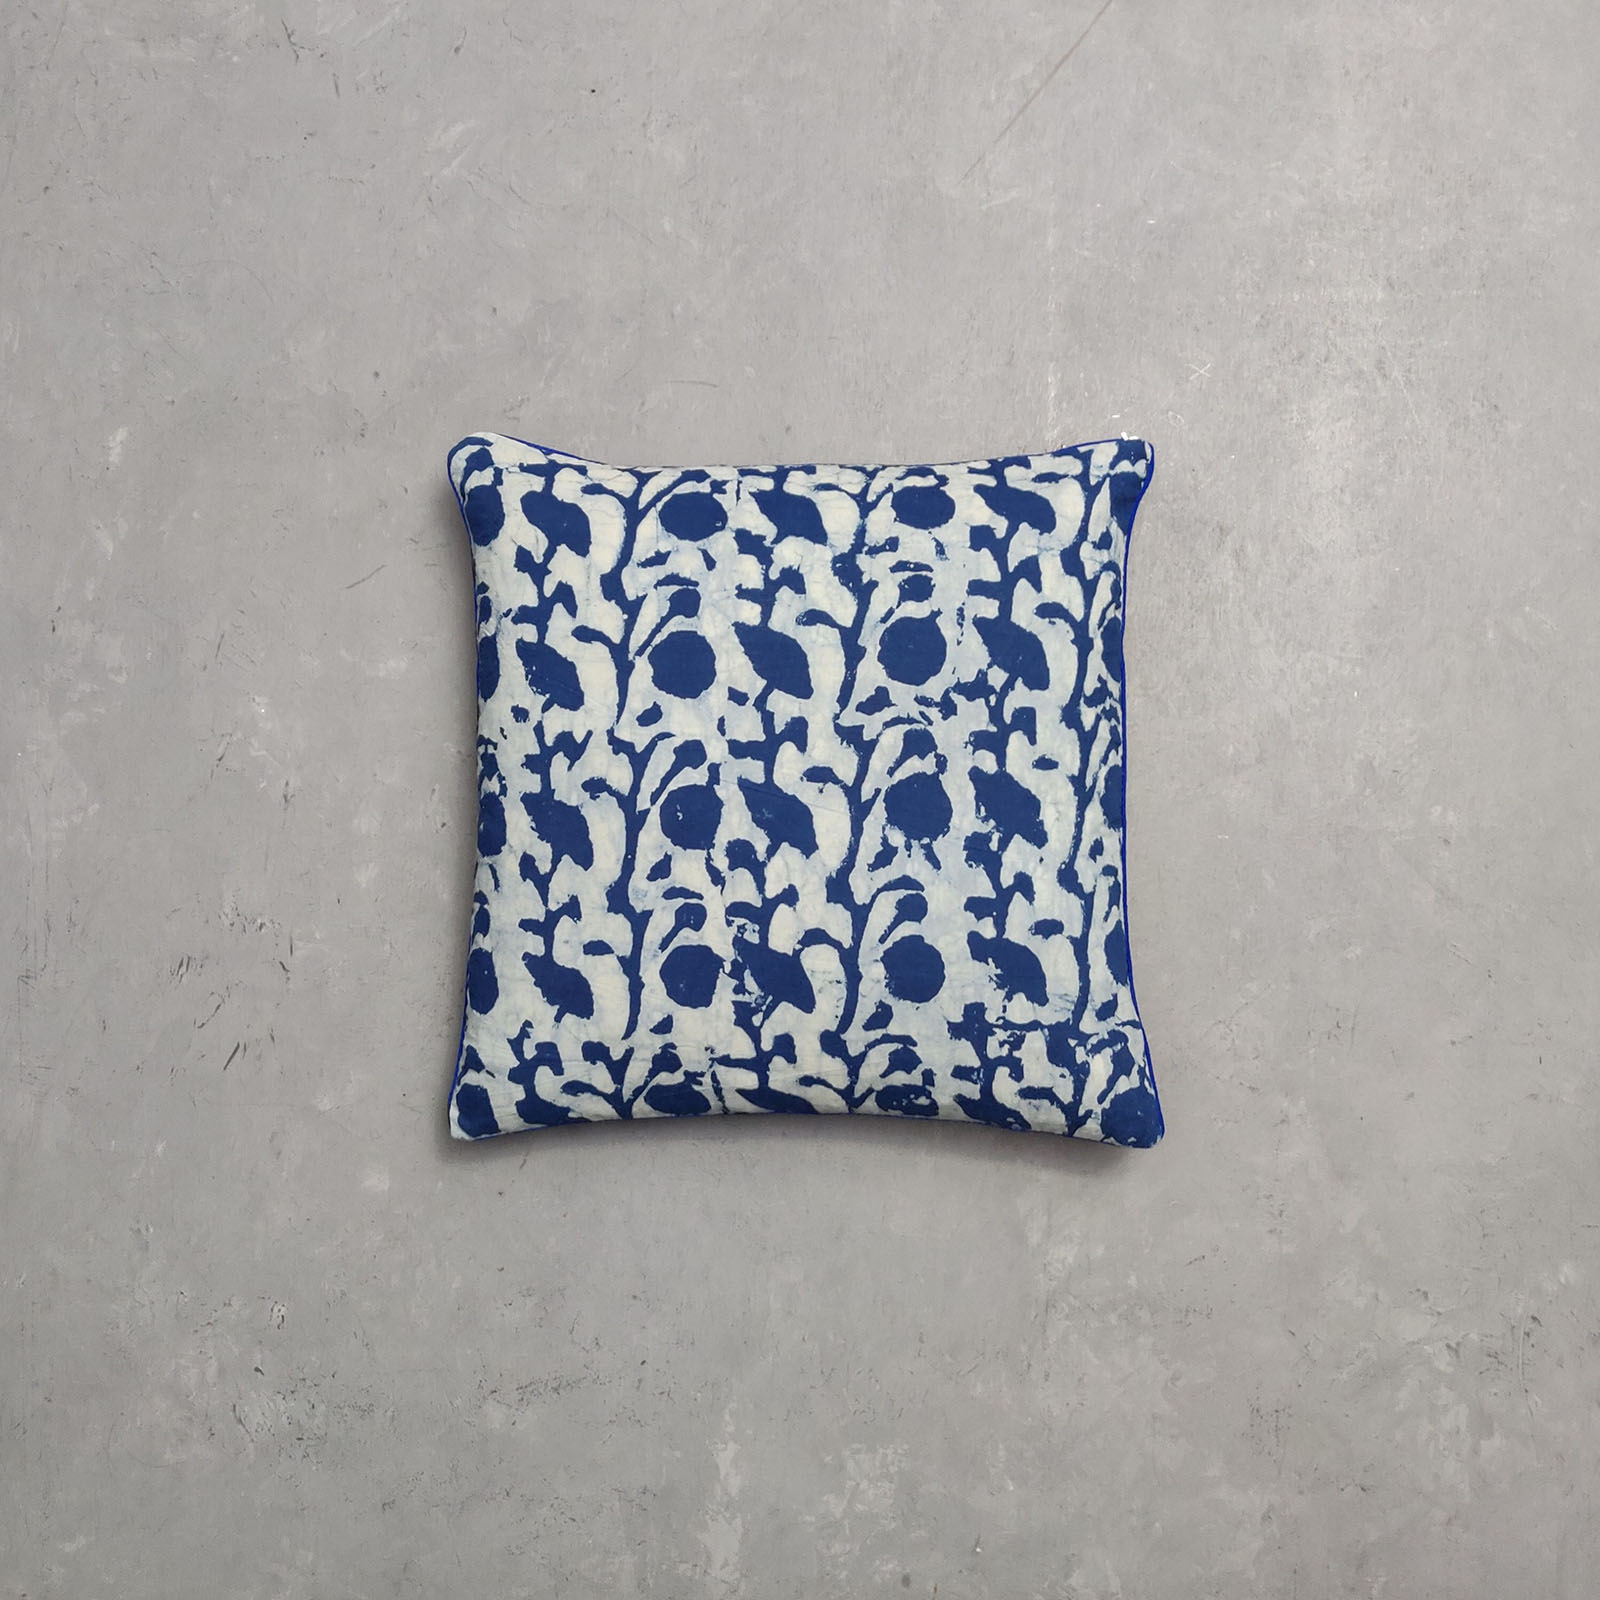 Reversible Indigo Handblock Printed Cushion Cover CC16